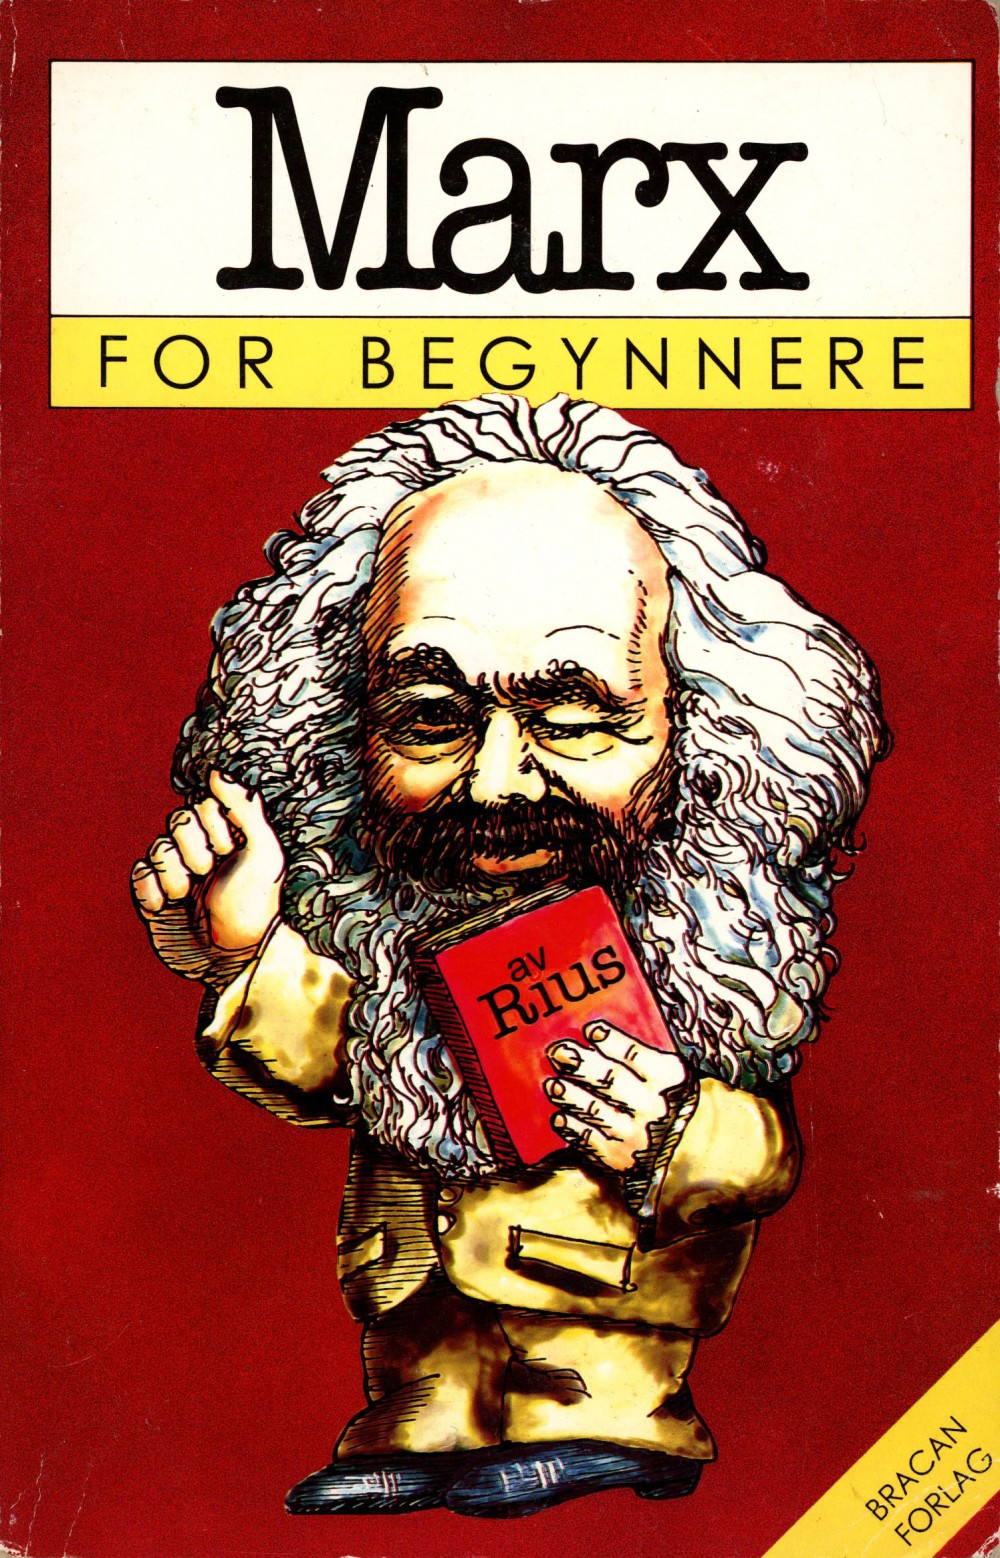 Eduardo del Rio (Rius): Marx for begynnere